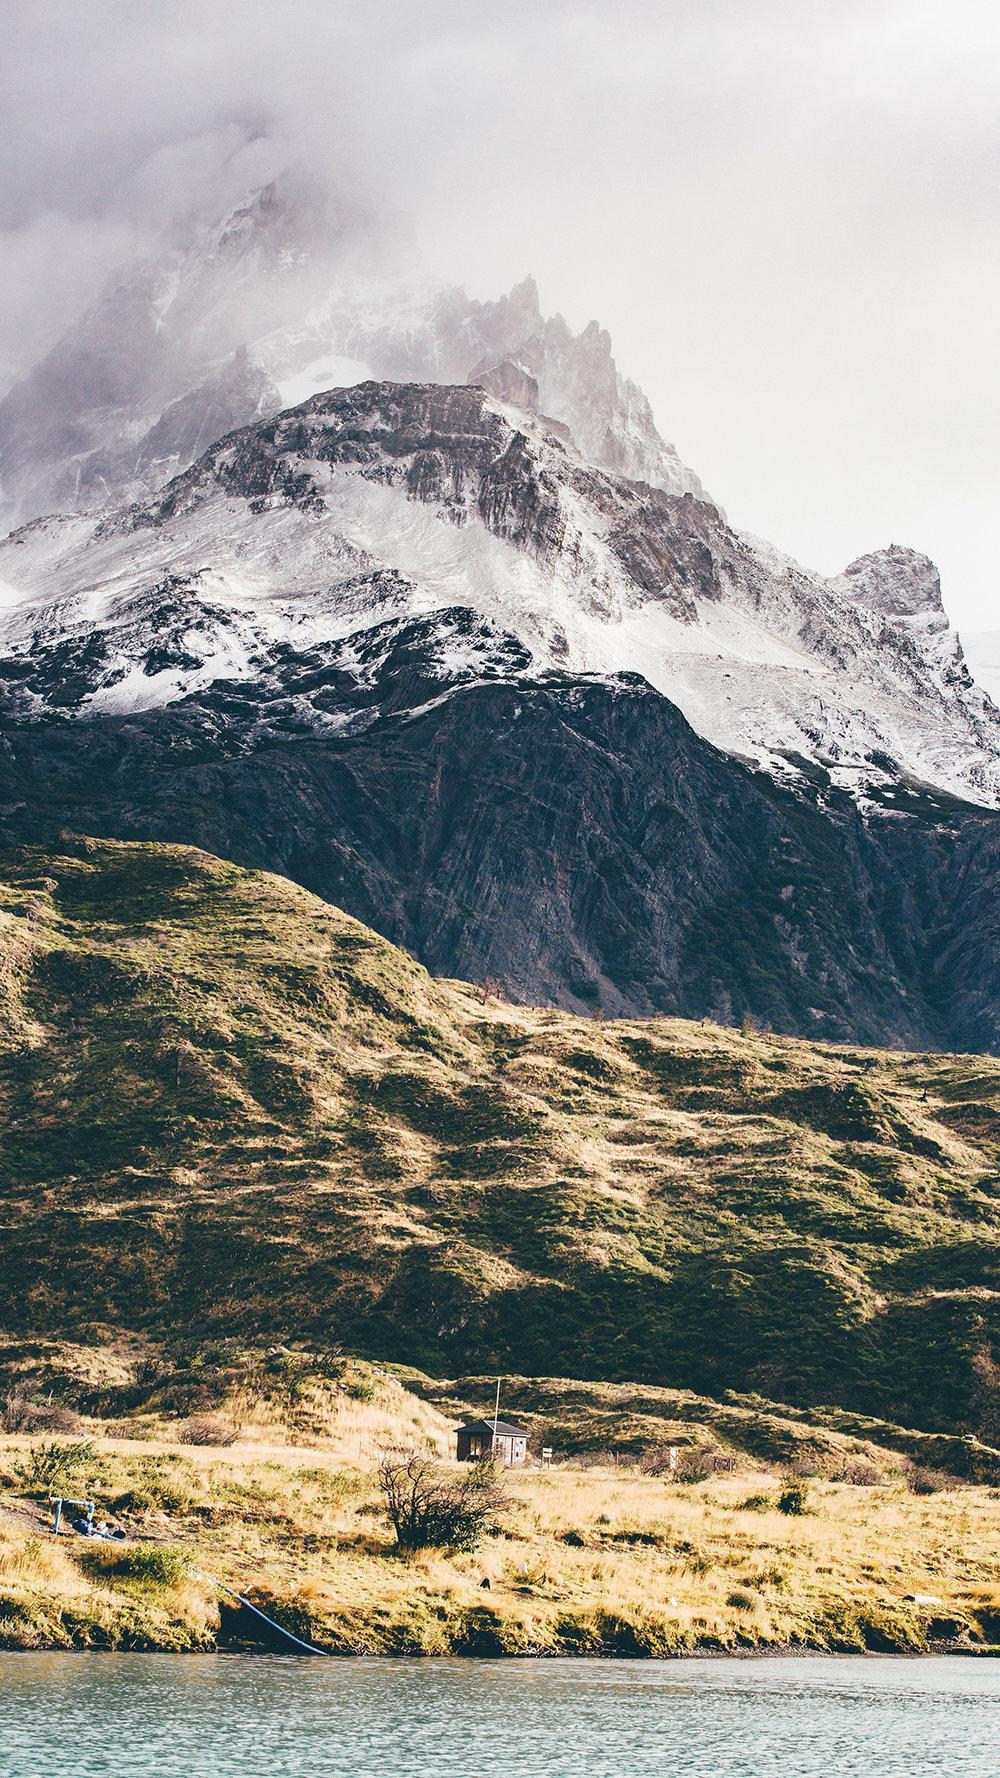 patagonia_06.jpg